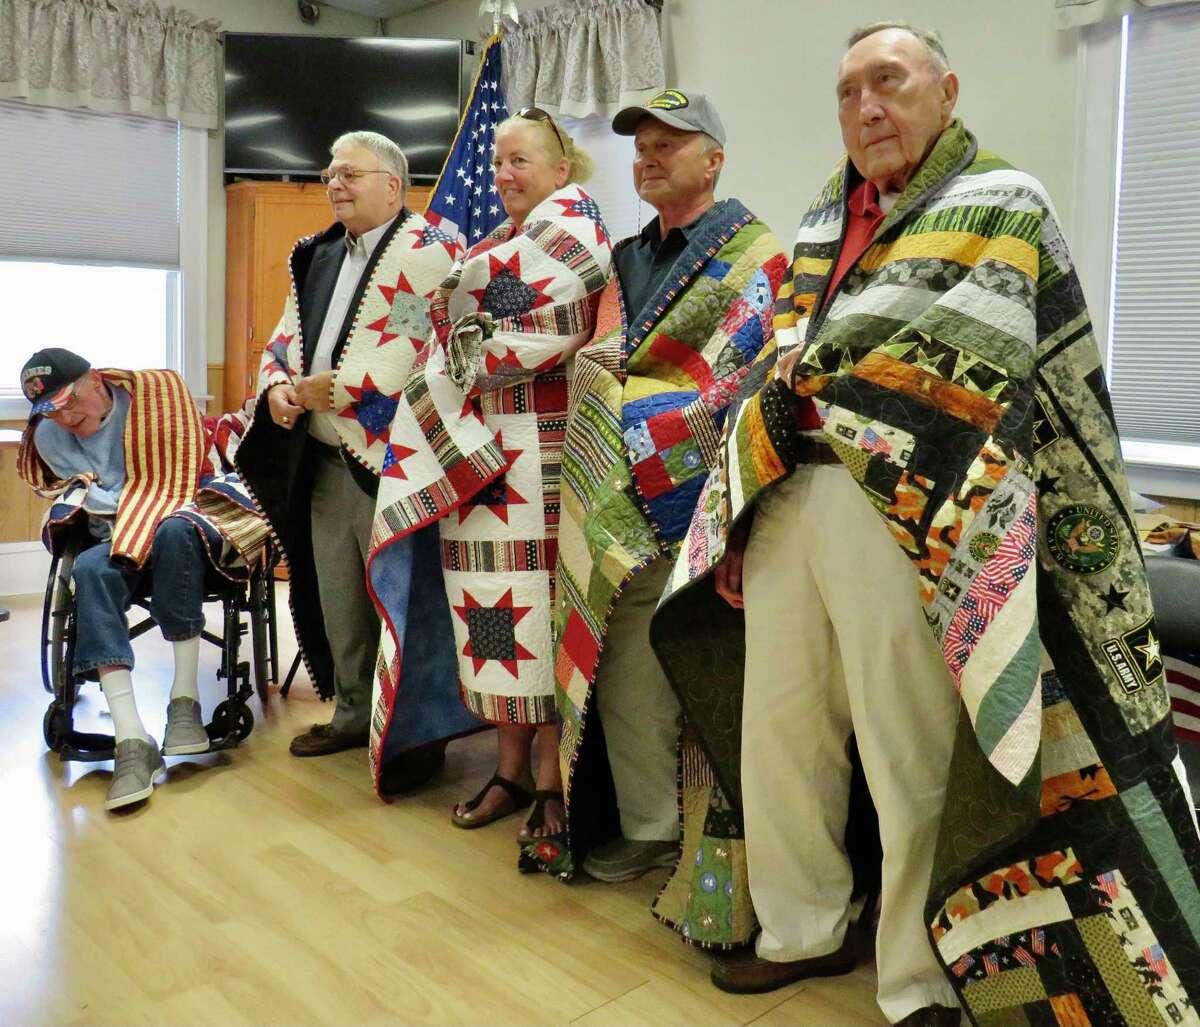 From left, Michael Simpson, U.S. Marine Corps; Michael Liberta, U.S. Army; Catherine Staunton, U.S. Navy; Robert Shirley, U.S. Army, and Richard Hopkins, U.S. Army.